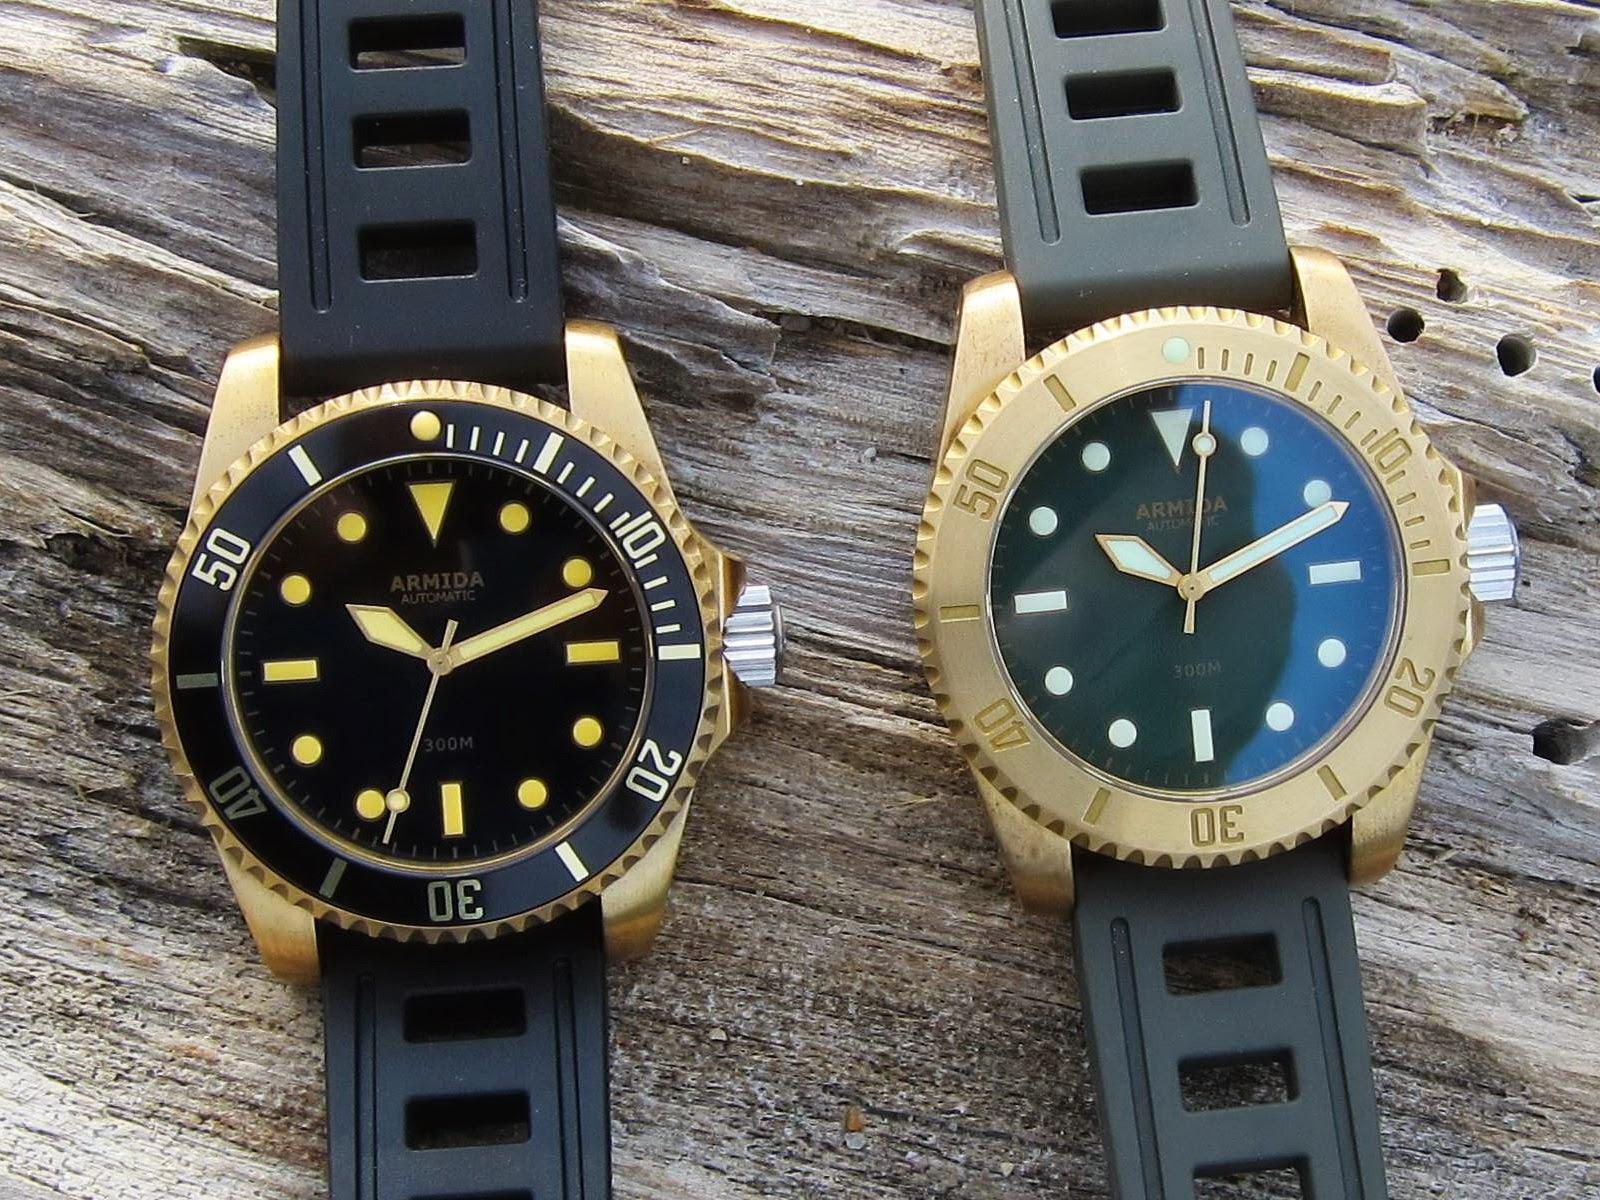 Que relojes de bronce conoceis? ARMIDA+A8+300M+Diver+BRASS+01